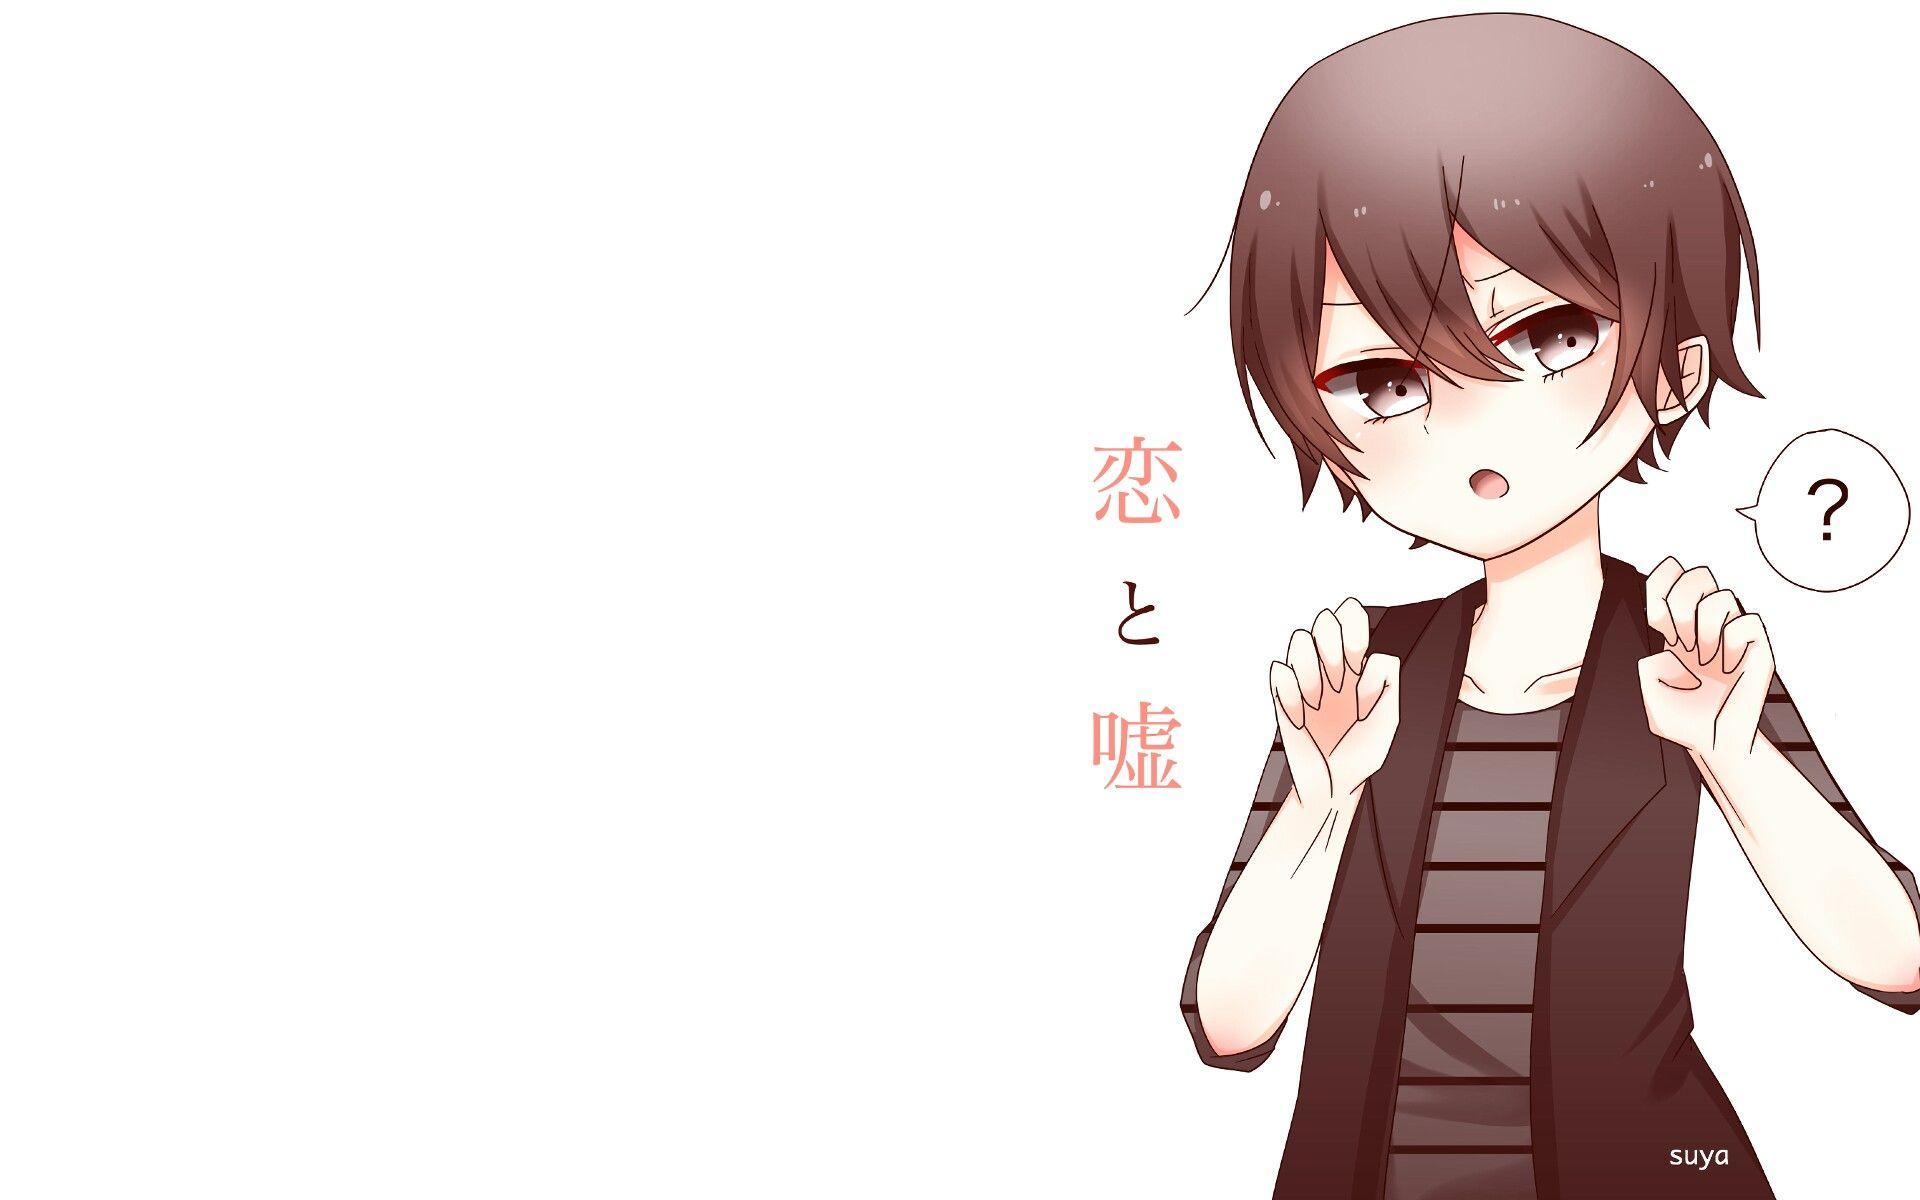 Koi To Uso Yuusuke Nisaka Anime Wallpaper Hd Cute Nya Cat Gus Hand If Cat Style Food Angry Boy Cuteeee Meaw Anime Cute Anime Character Koi